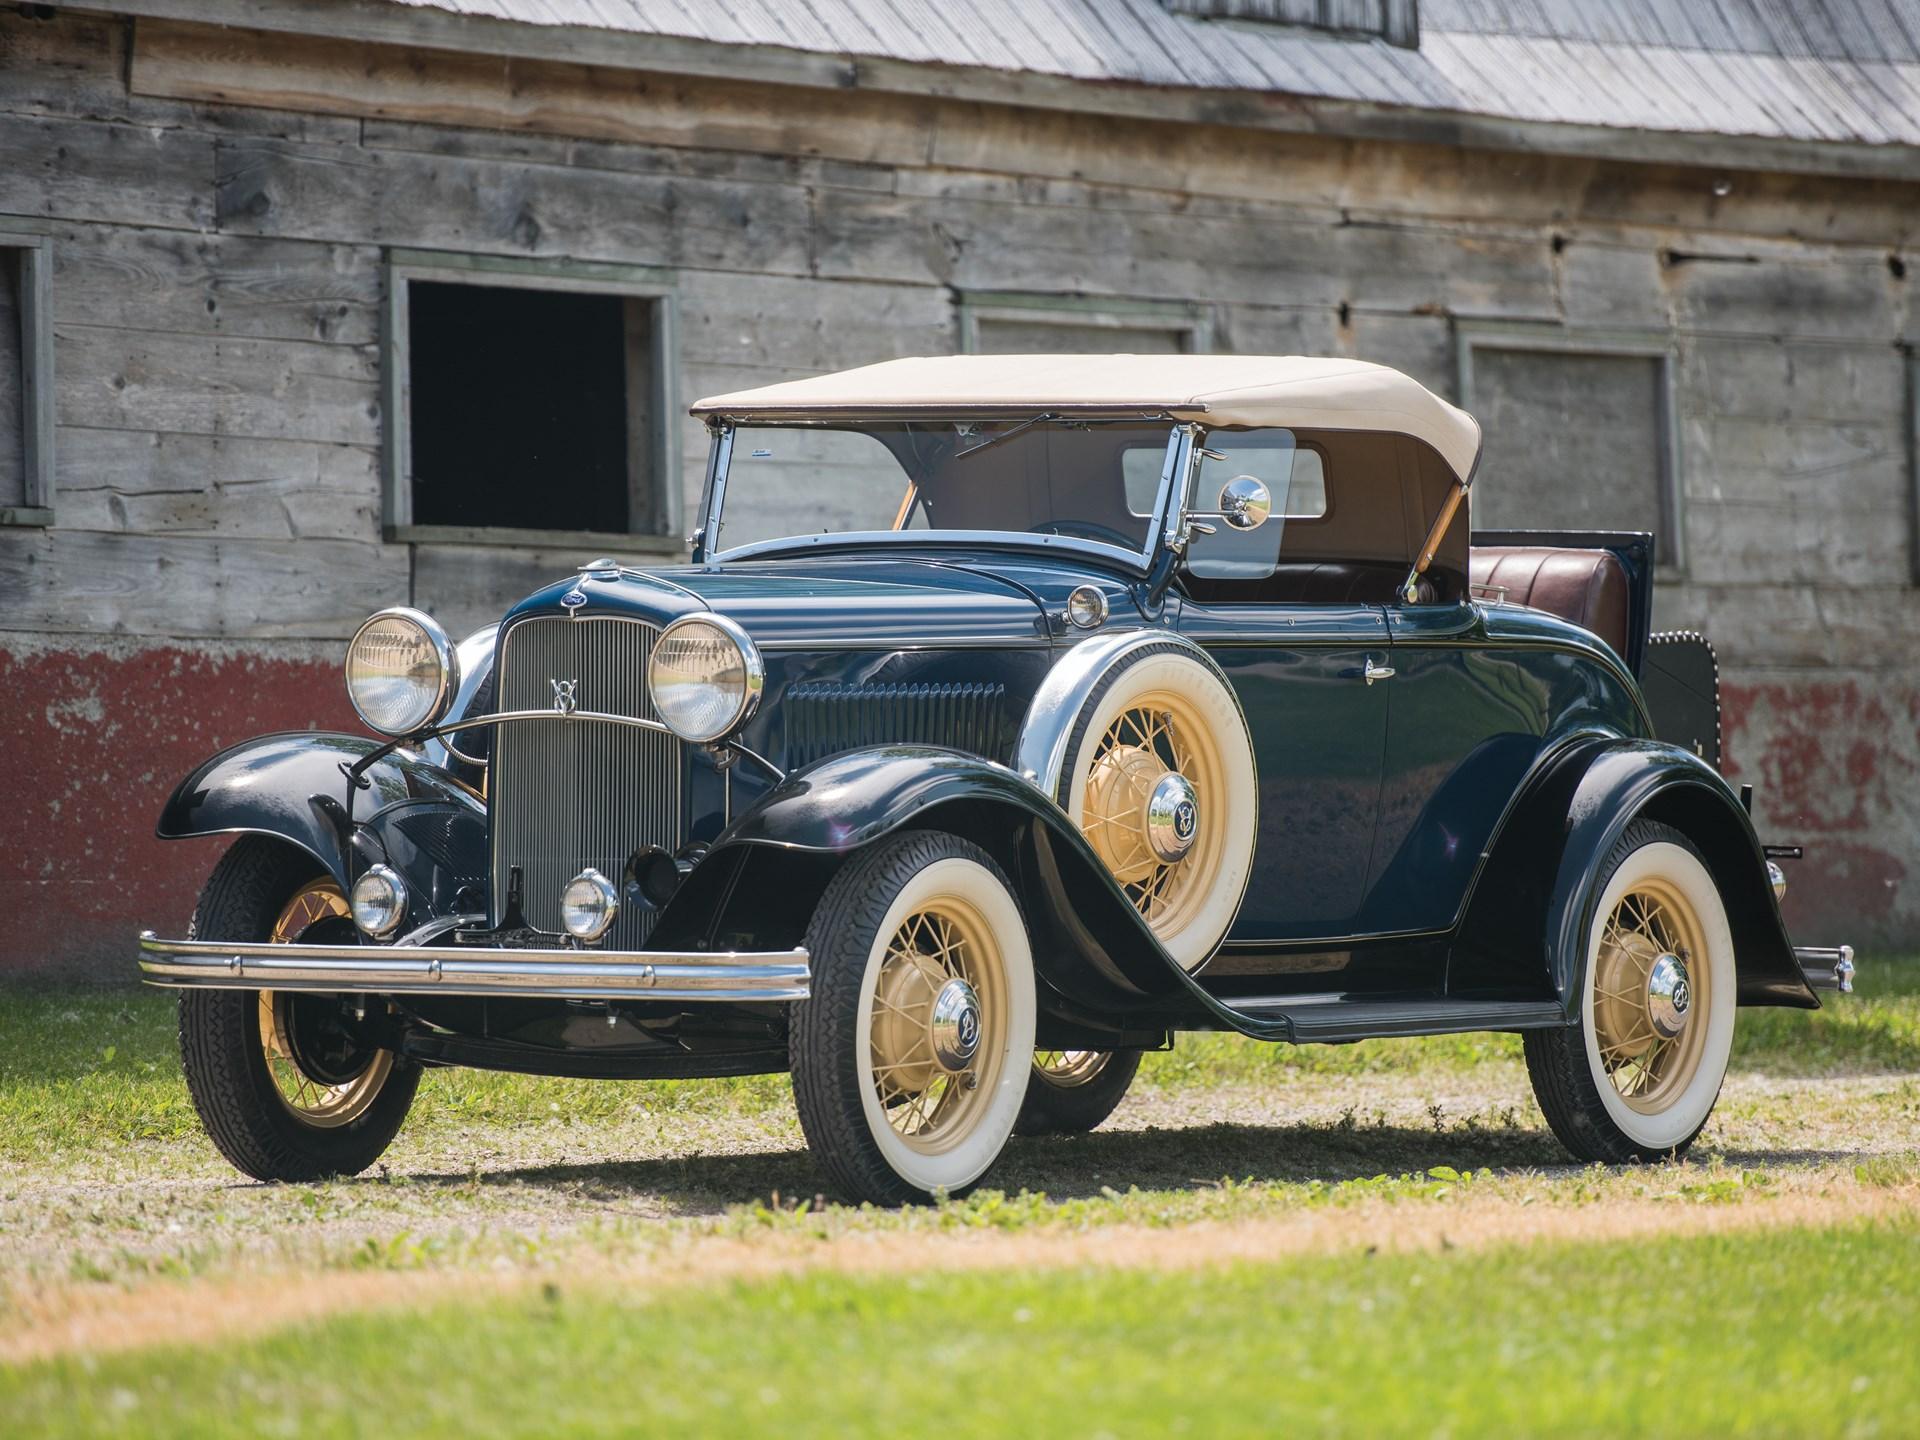 1932 ford v 8 deluxe roadster